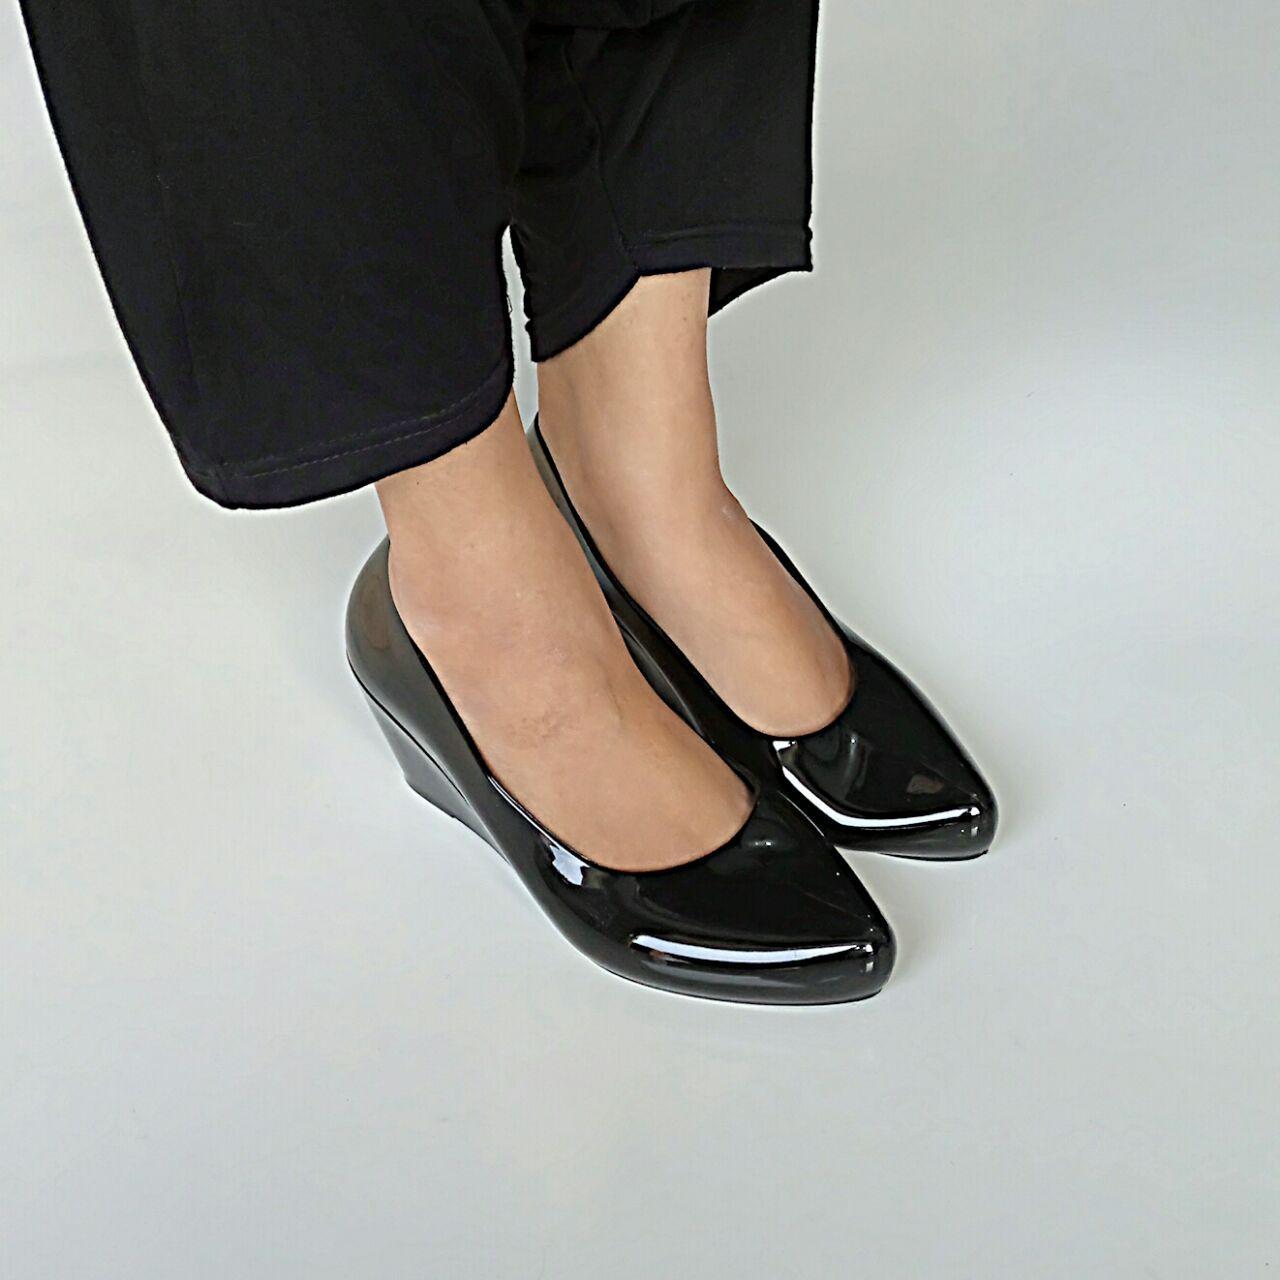 Ellen Taslim L-536 Jelly Wedges Impor Pantofel Hitam Glossy High Quality